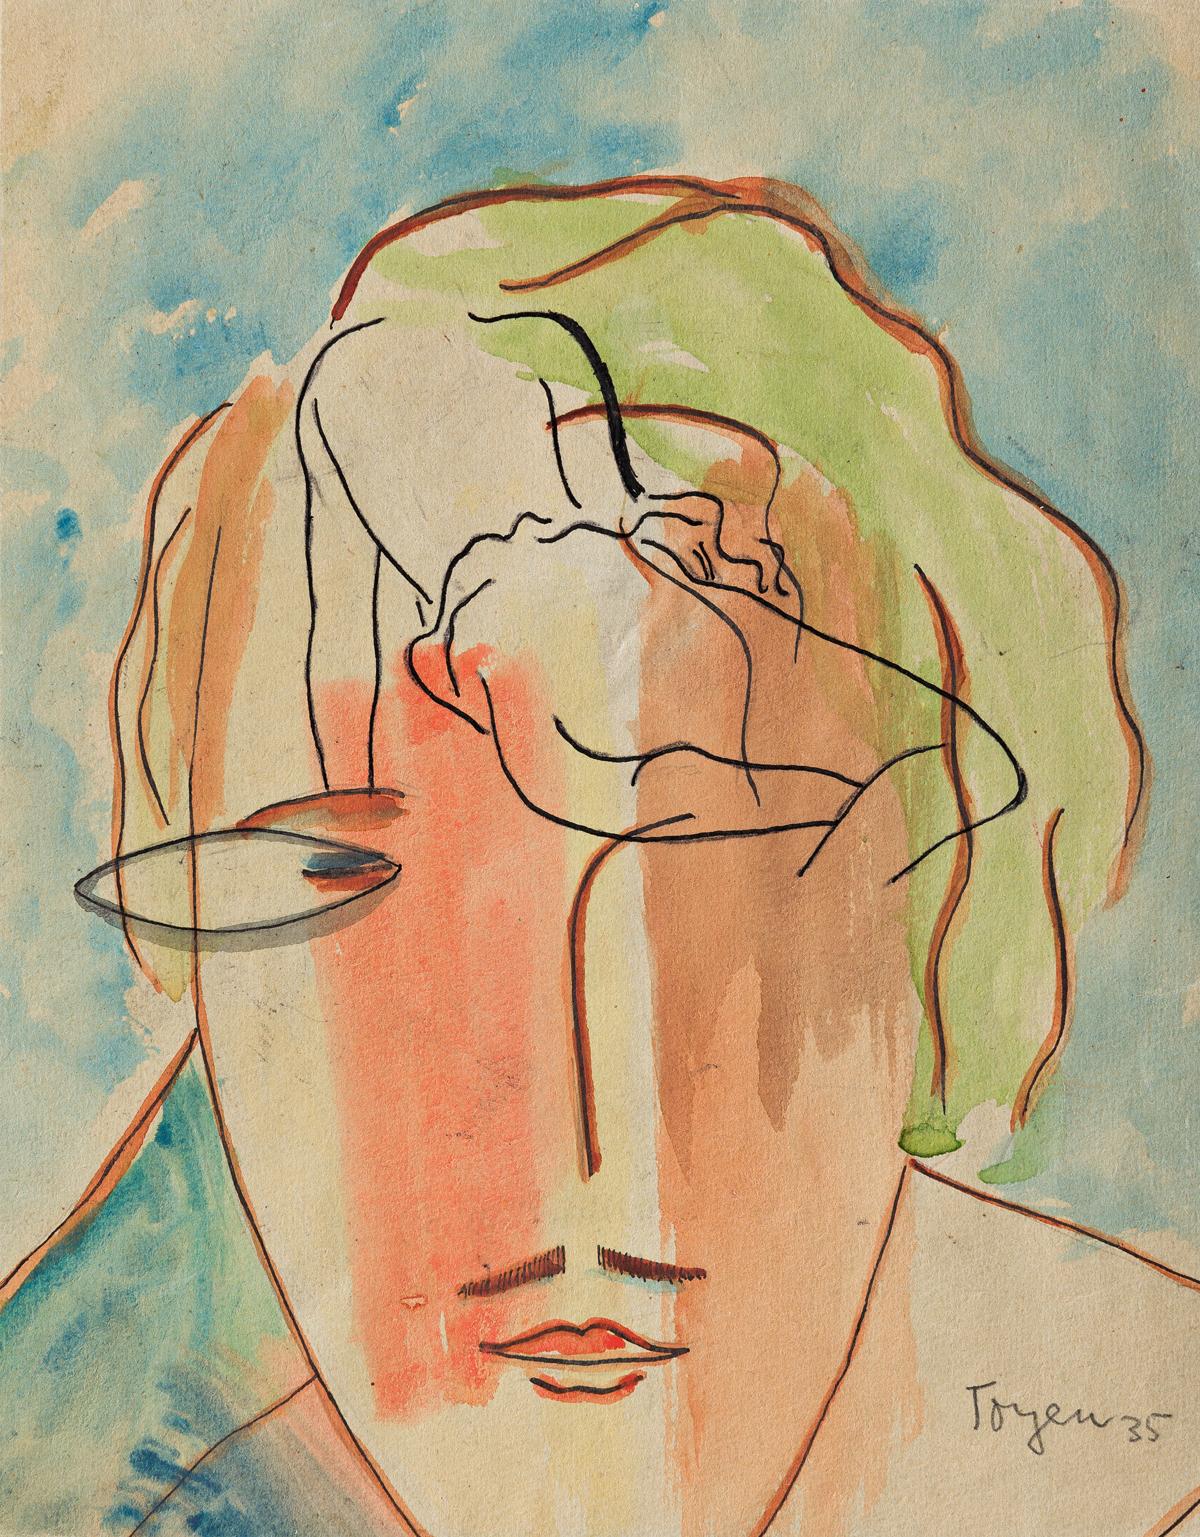 TOYEN (MARIE CERMINOVA, 1902-1980) Untitled Portrait with Nude.